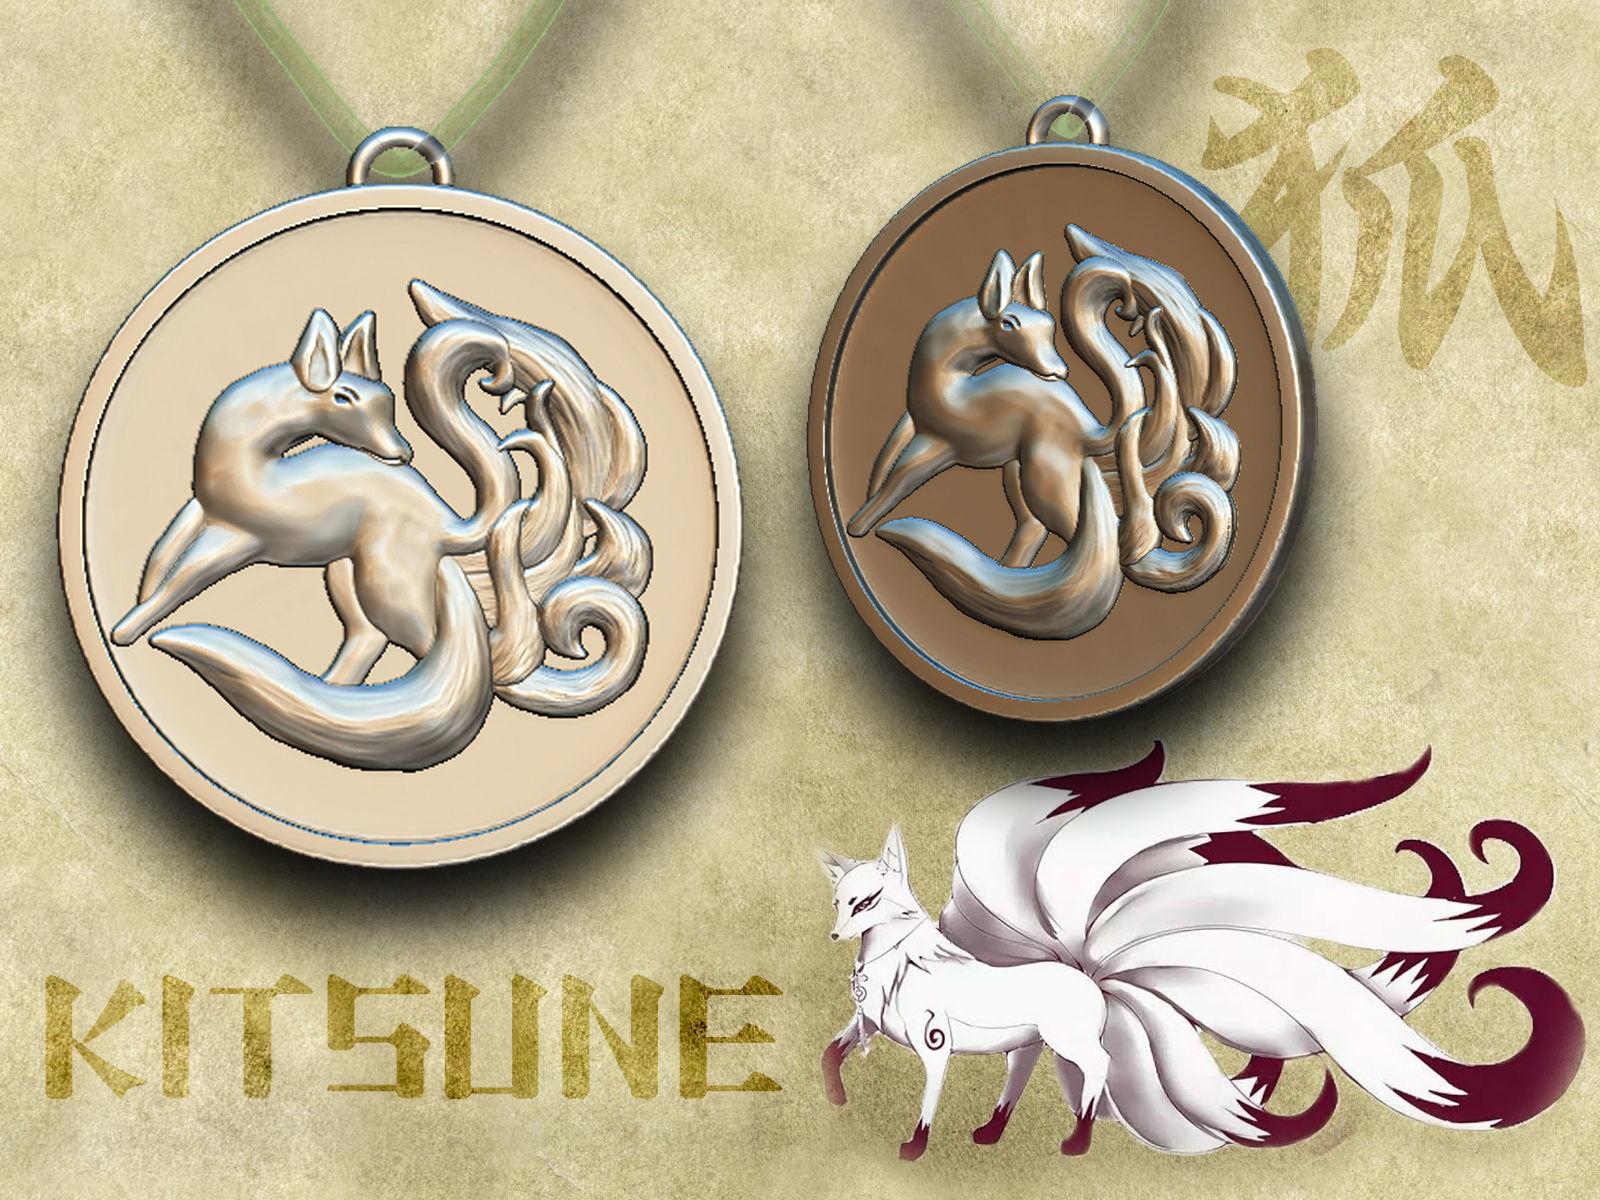 Medallion of Kitsune - nine-tailed fox